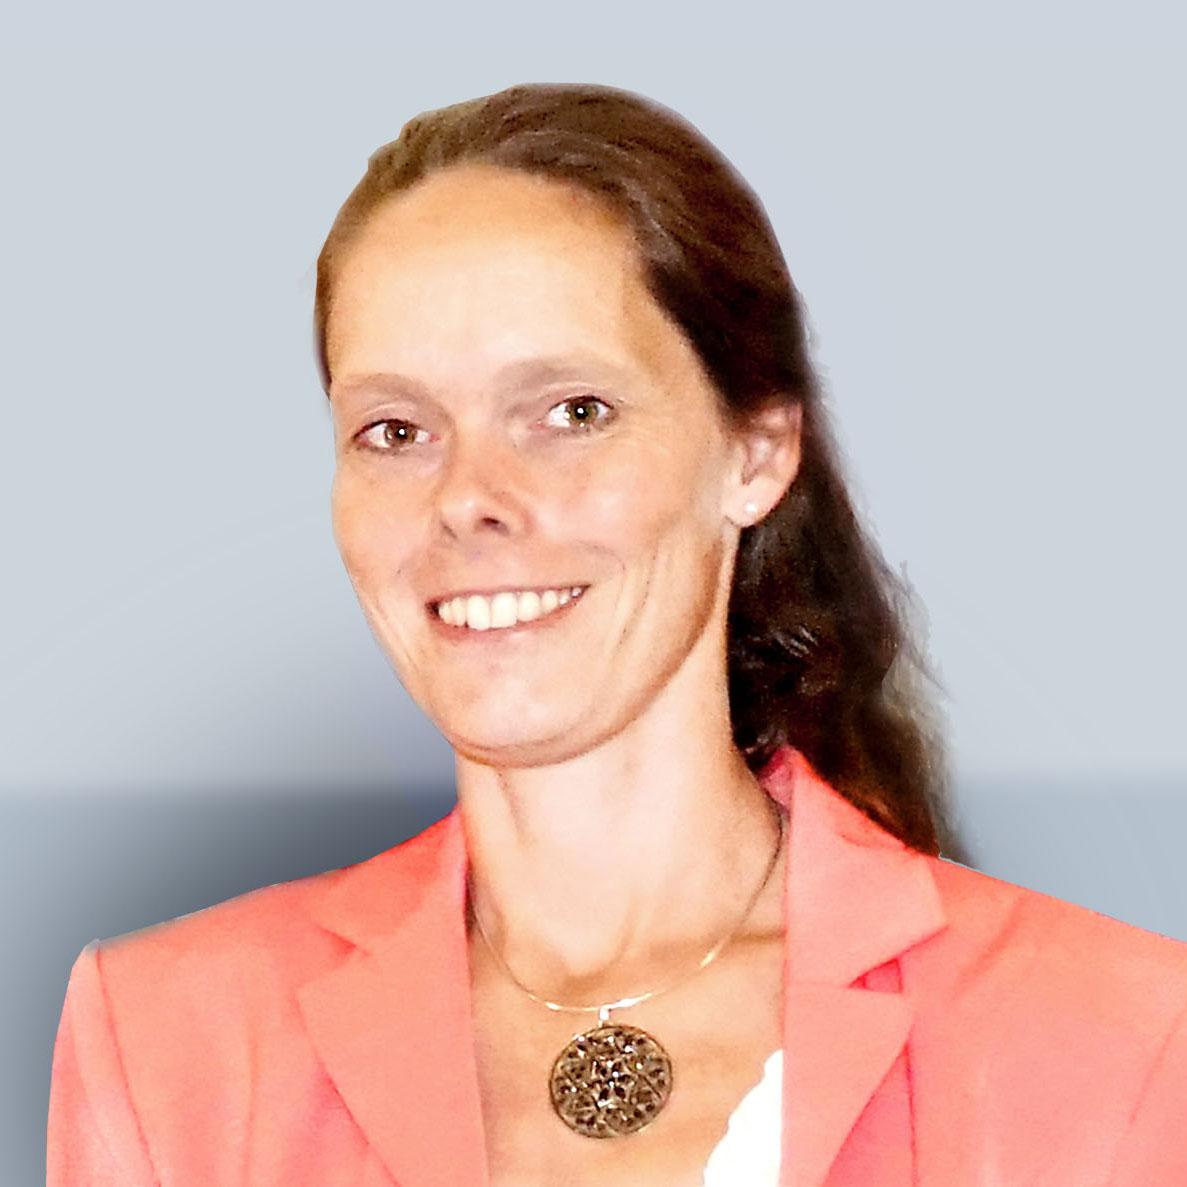 Sandra <BR> Goericke-Pesch